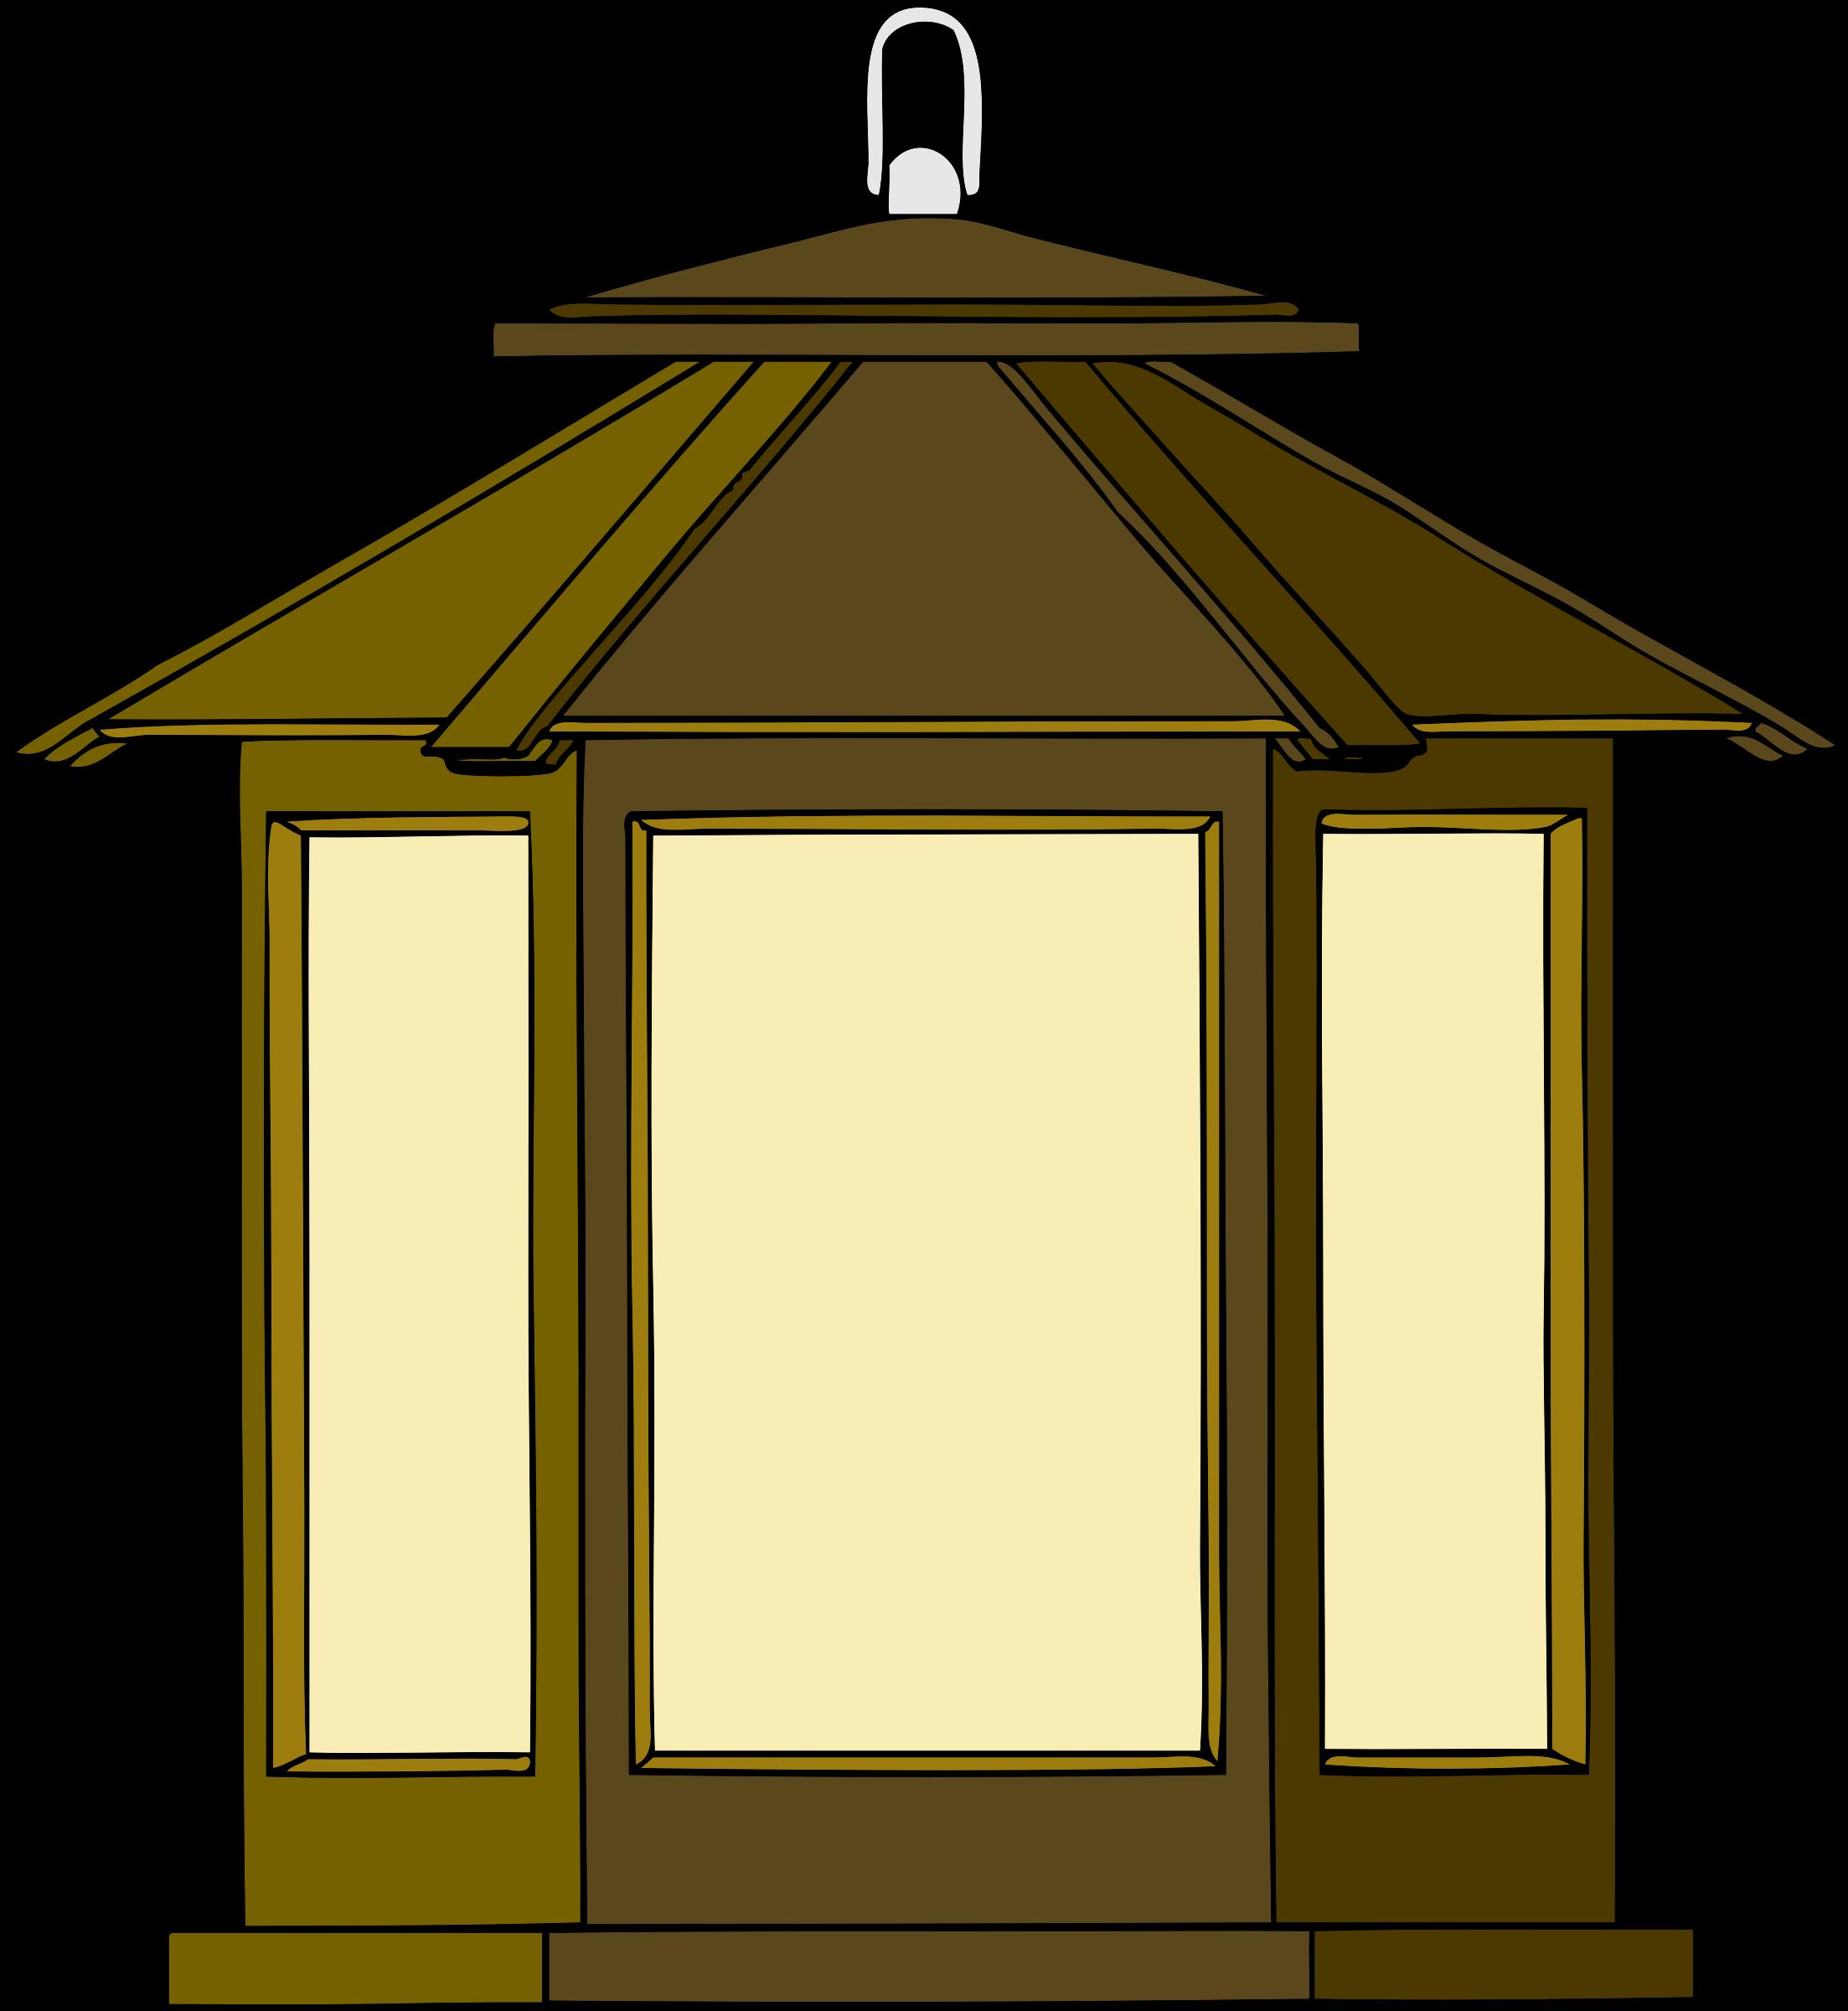 Big image png. Lantern clipart latern